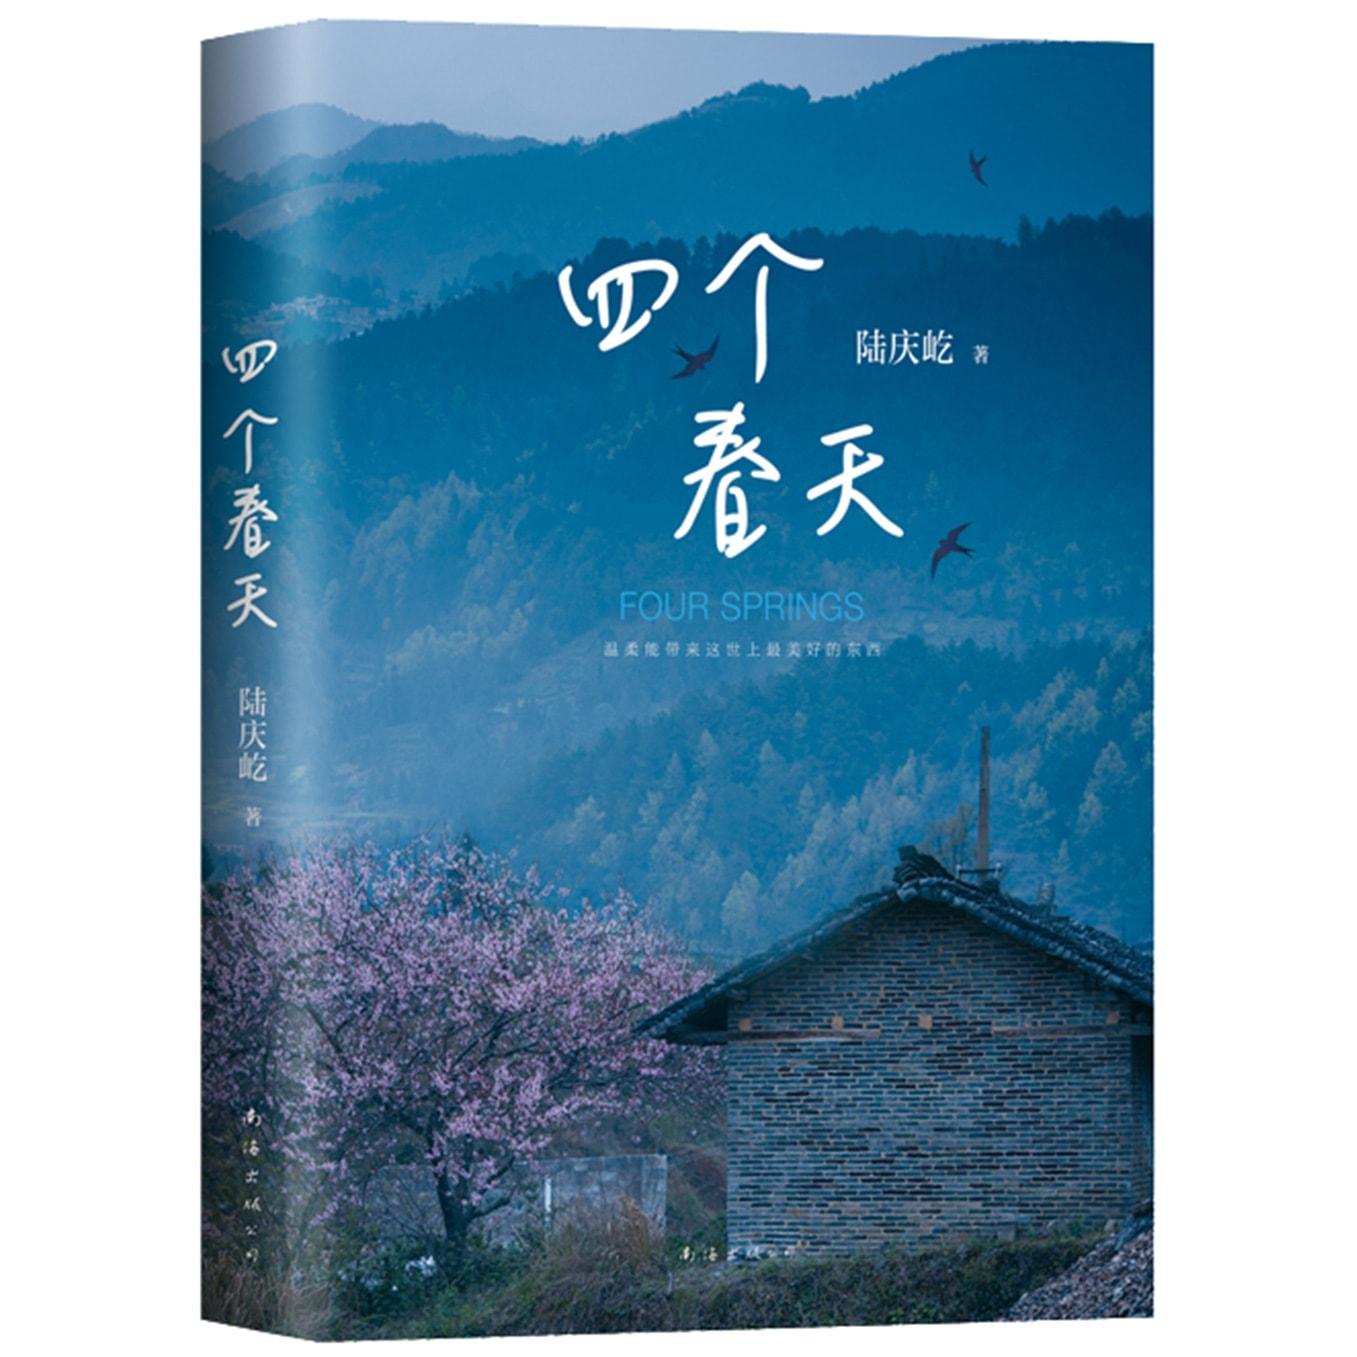 Yamibuy.com:Customer reviews:四个春天(跨越山海,勿忘回家)